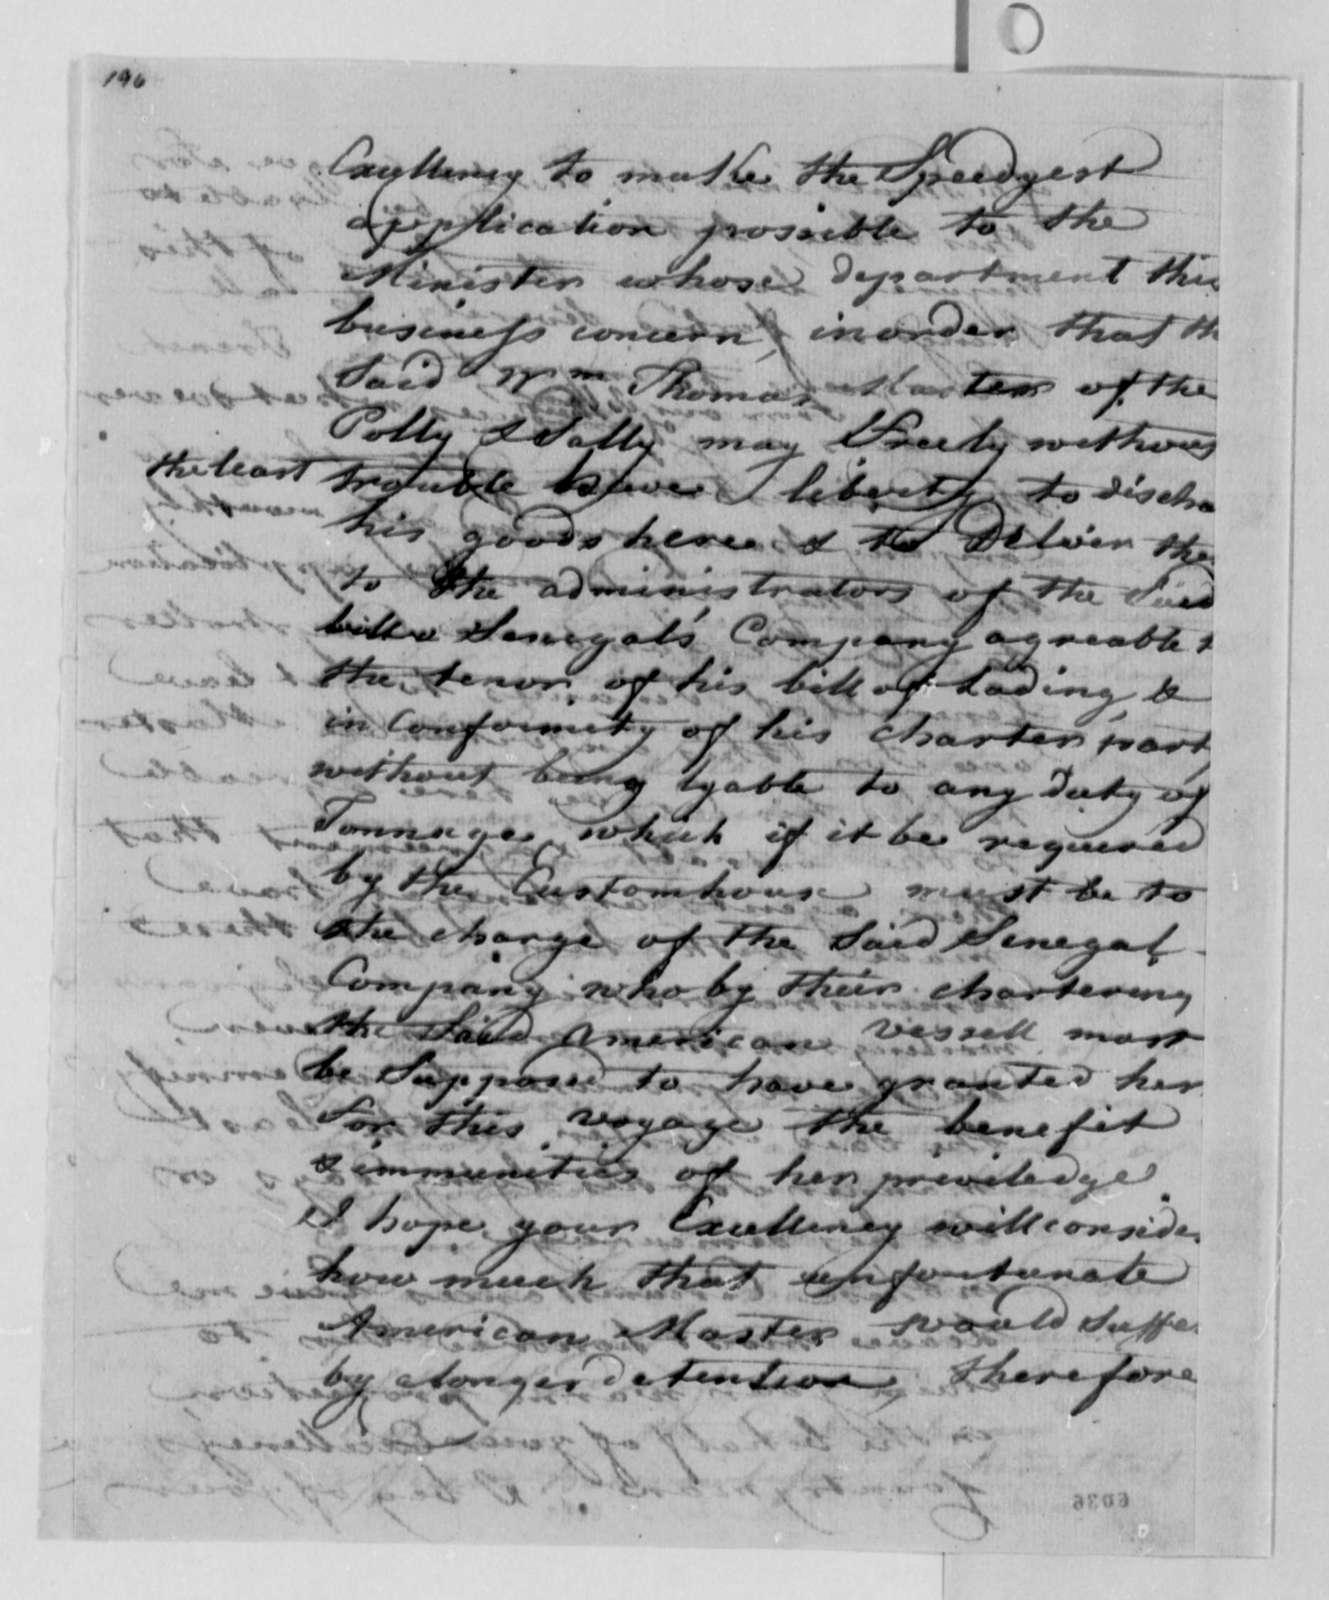 Andre Limozin to Thomas Jefferson, December 18, 1787